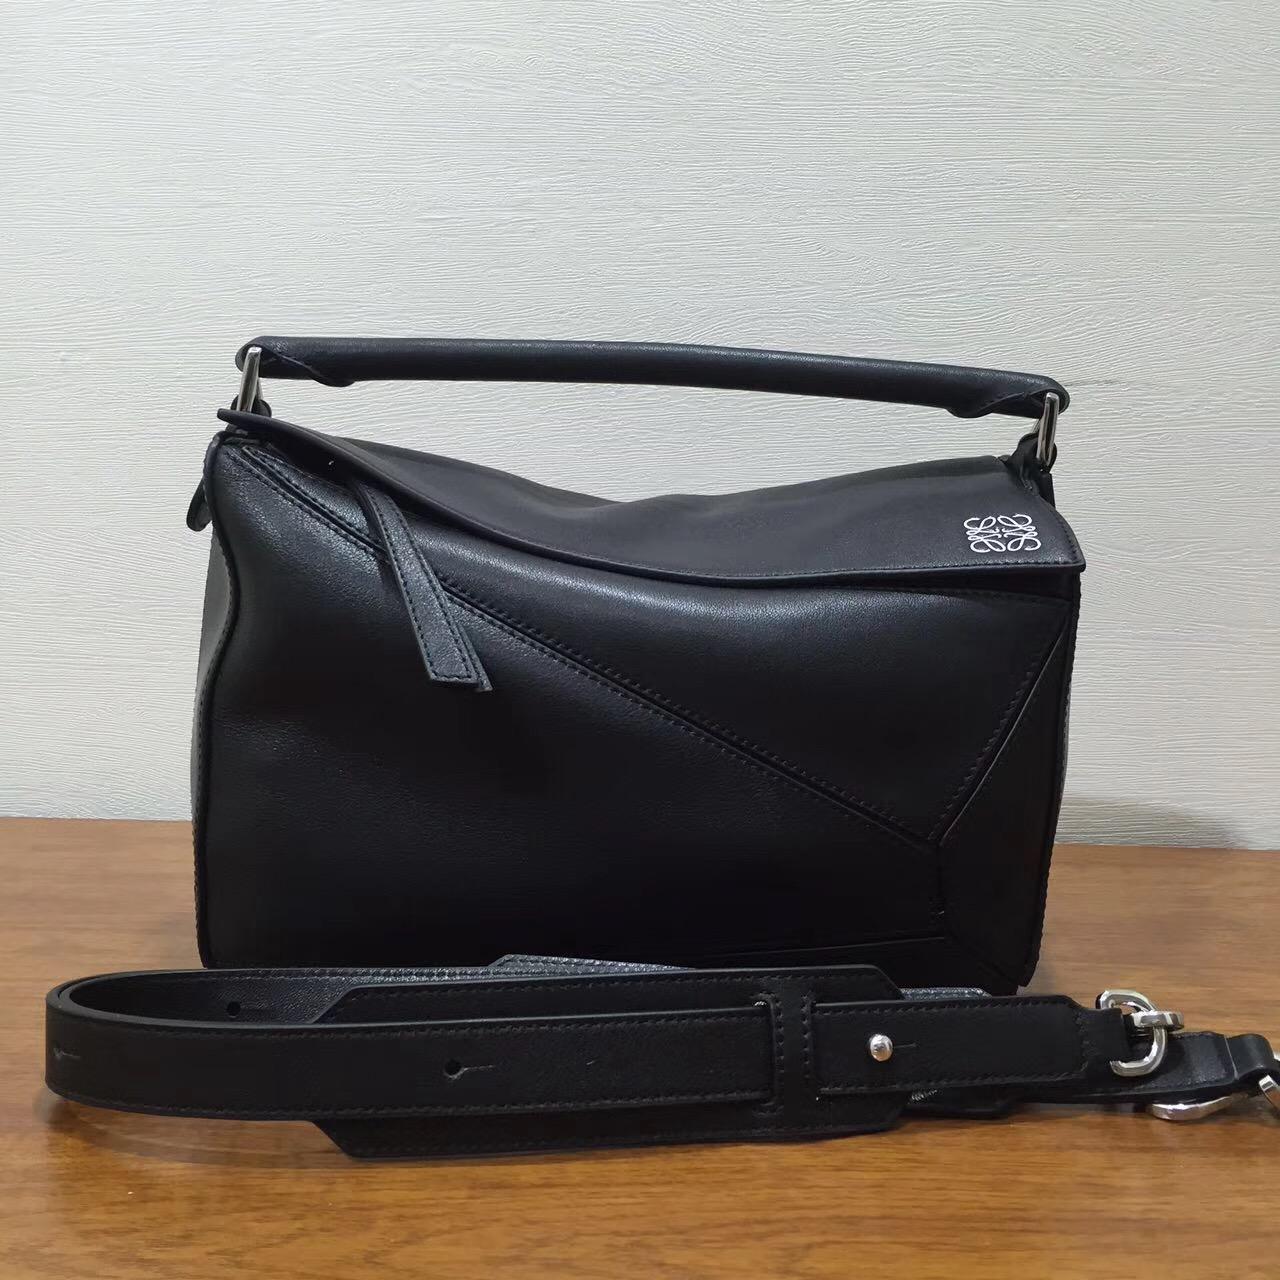 Loewe羅意威女包幾何包 中號 Puzzle Bag 黑色